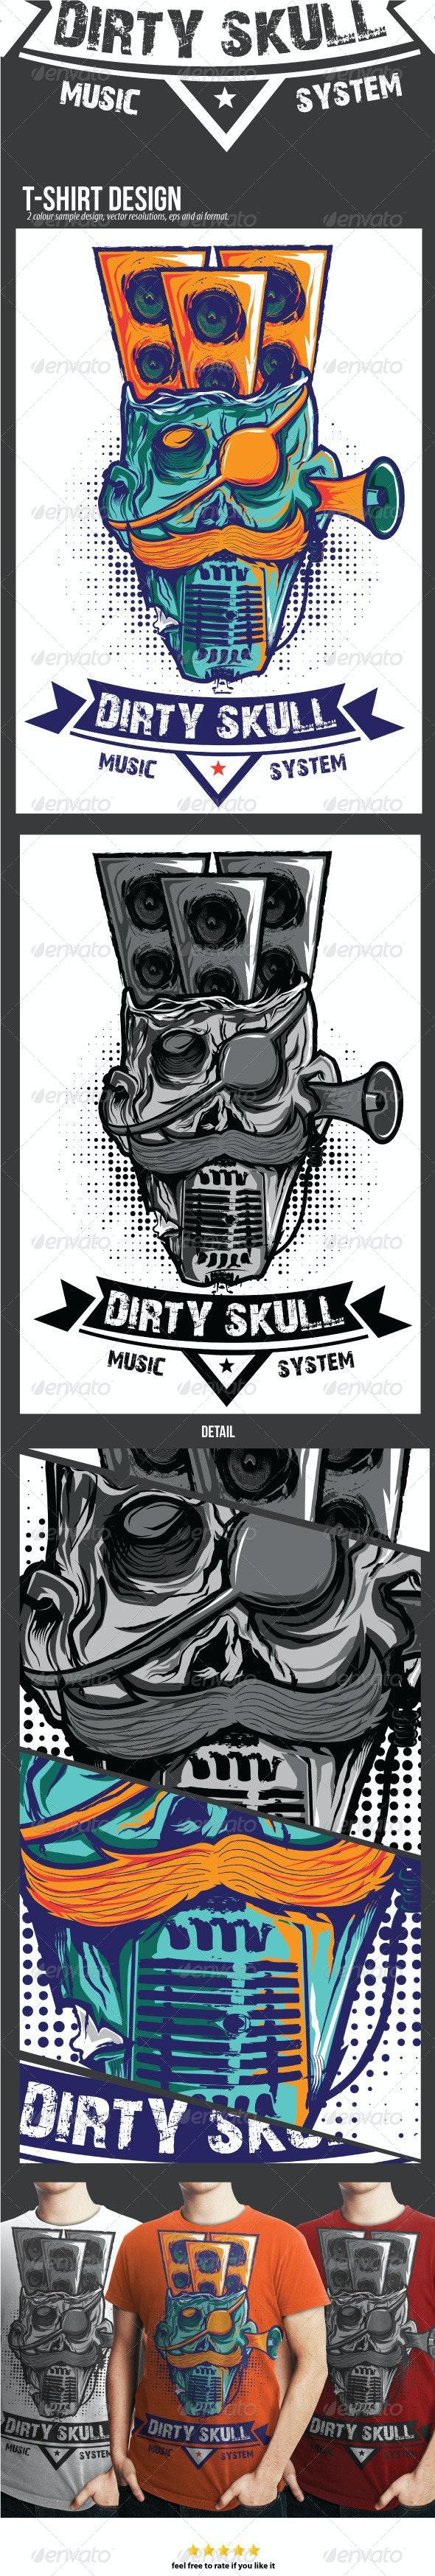 Dirty Skull Music System T-shirt Design - Designs T-Shirts